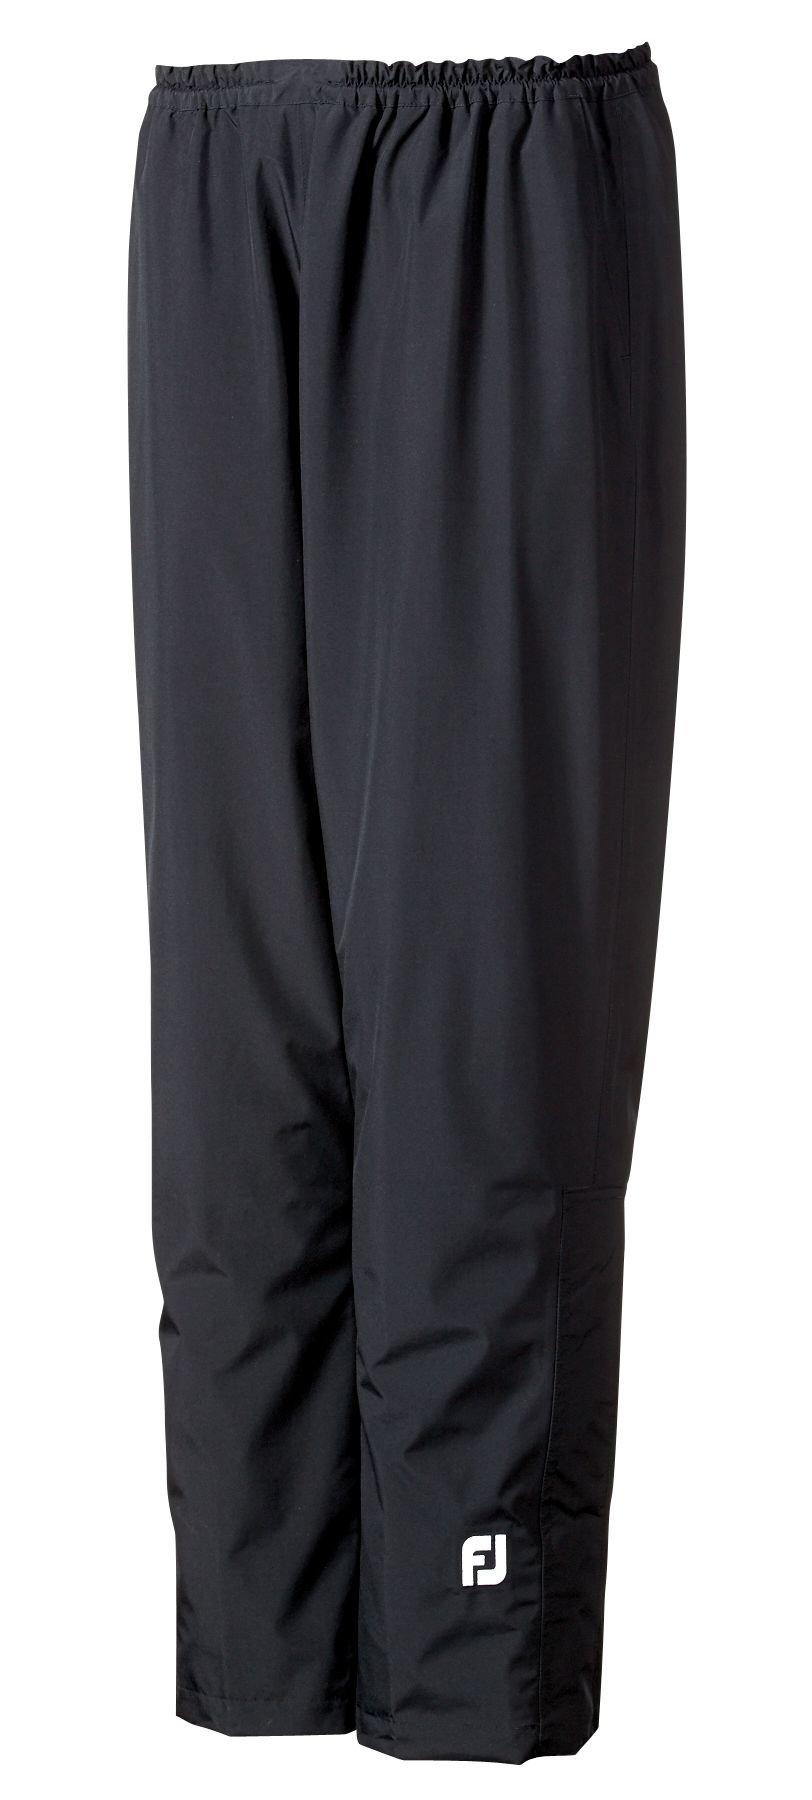 FootJoy Men's Golf Rain Pants (Black, X-Large)